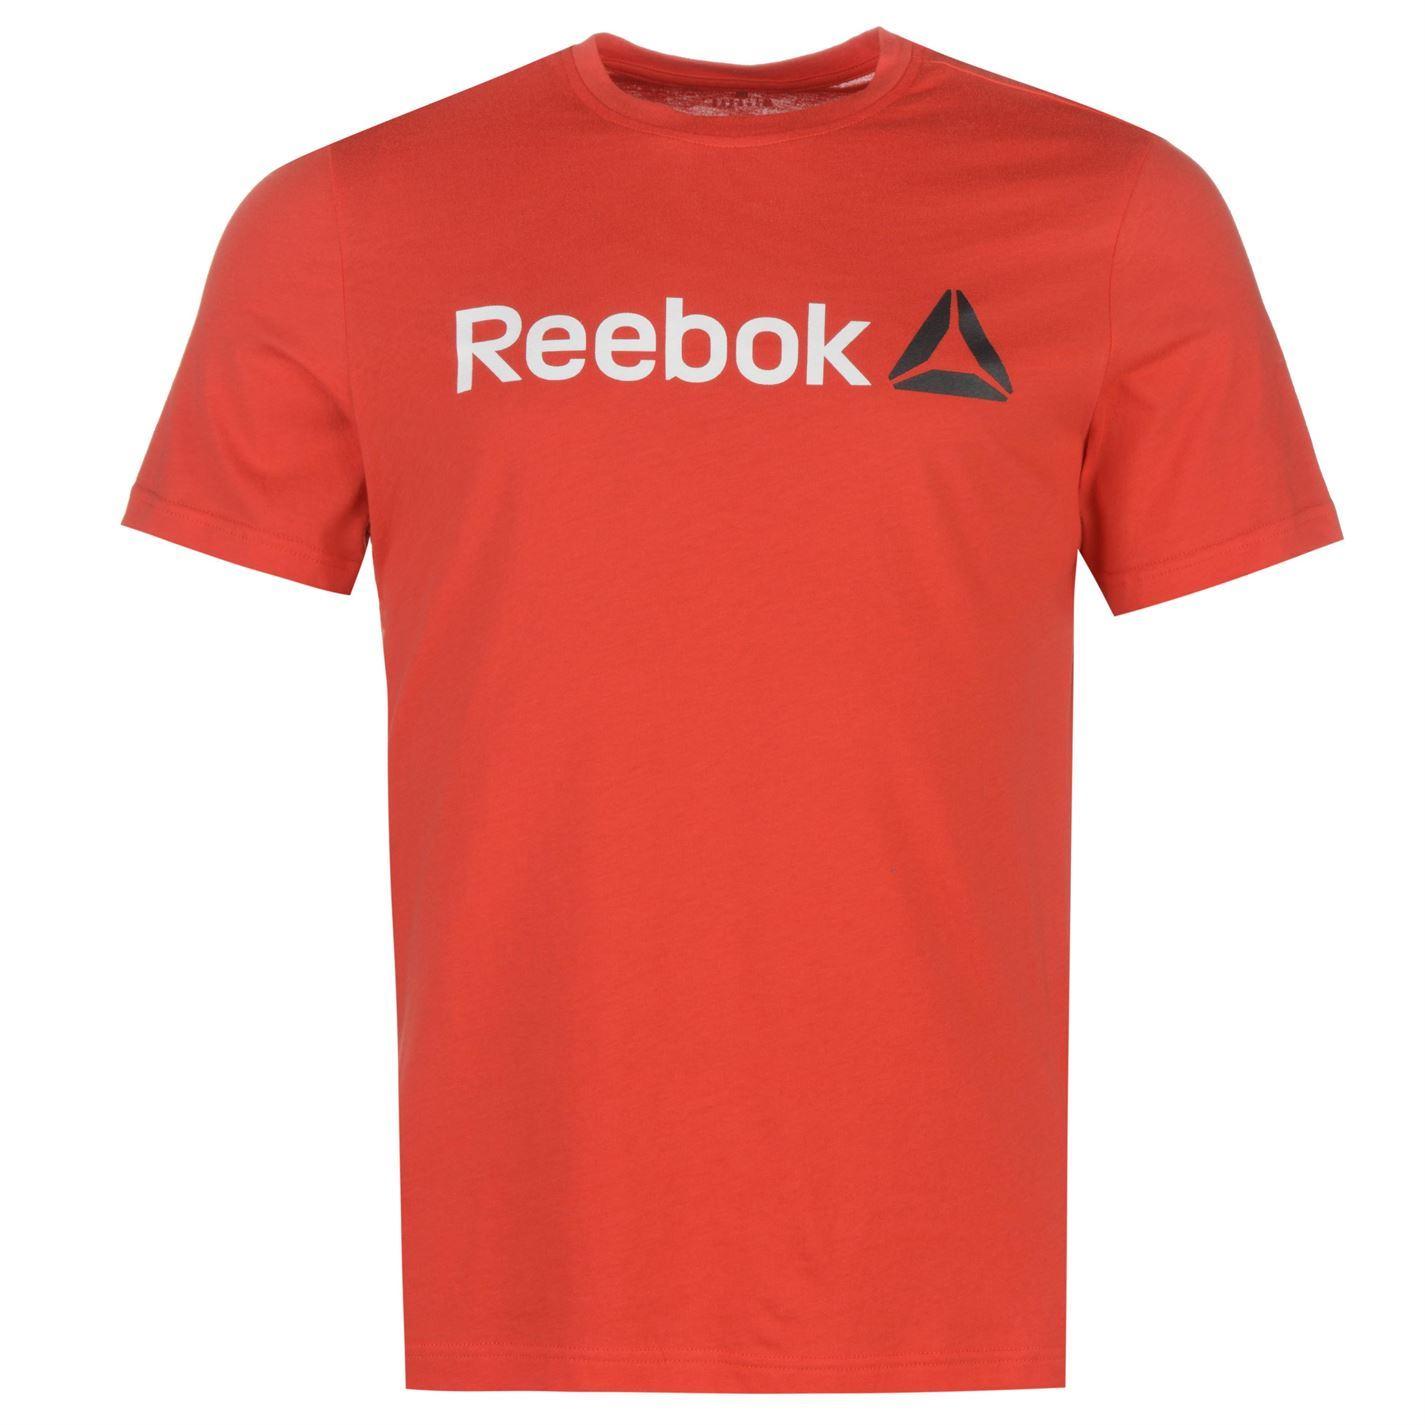 Reebok-Delta-Logo-T-Shirt-Mens-Tee-Shirt-Top thumbnail 33